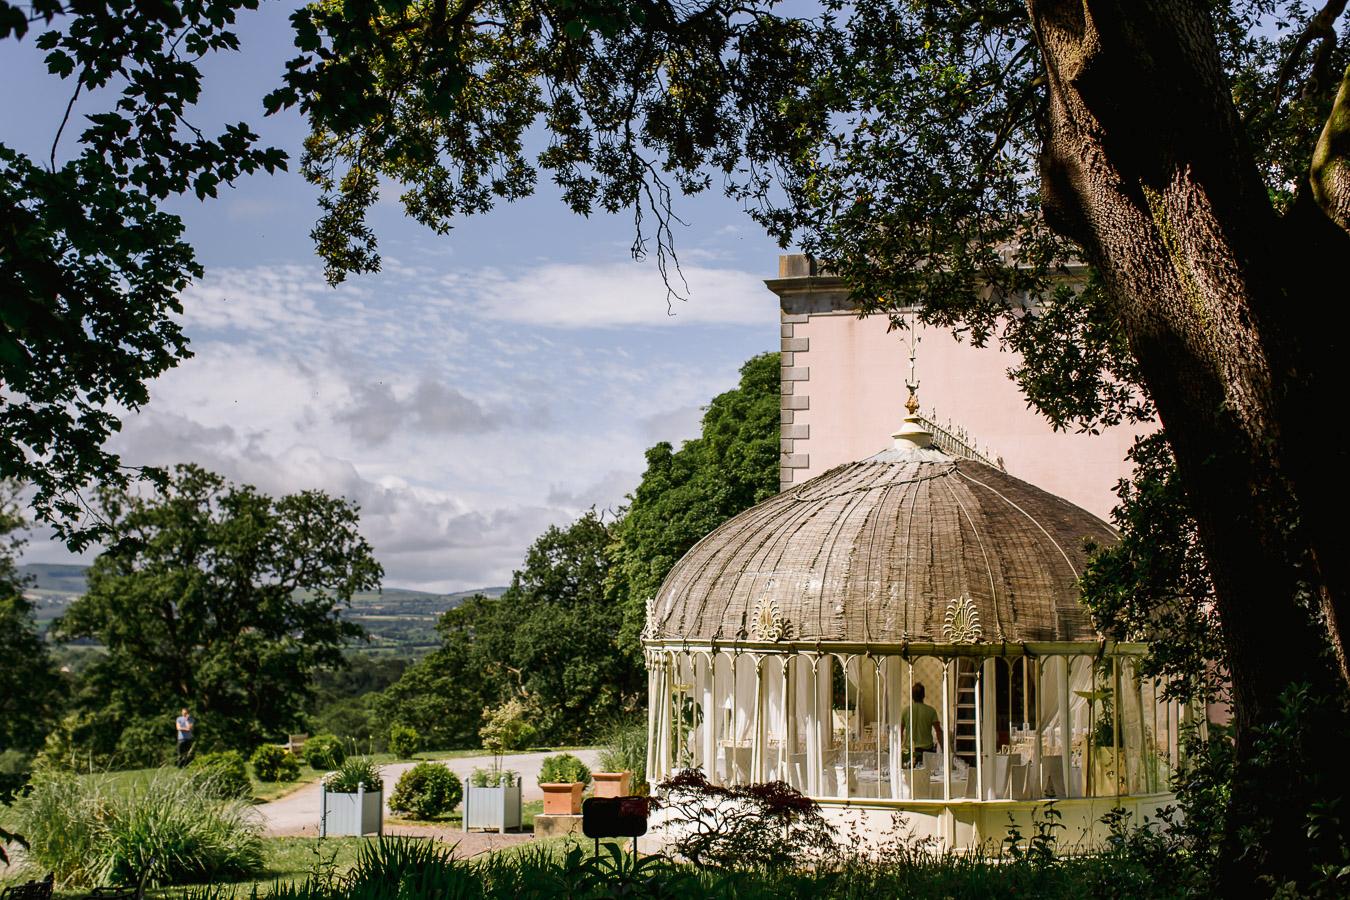 longueville house orangerie